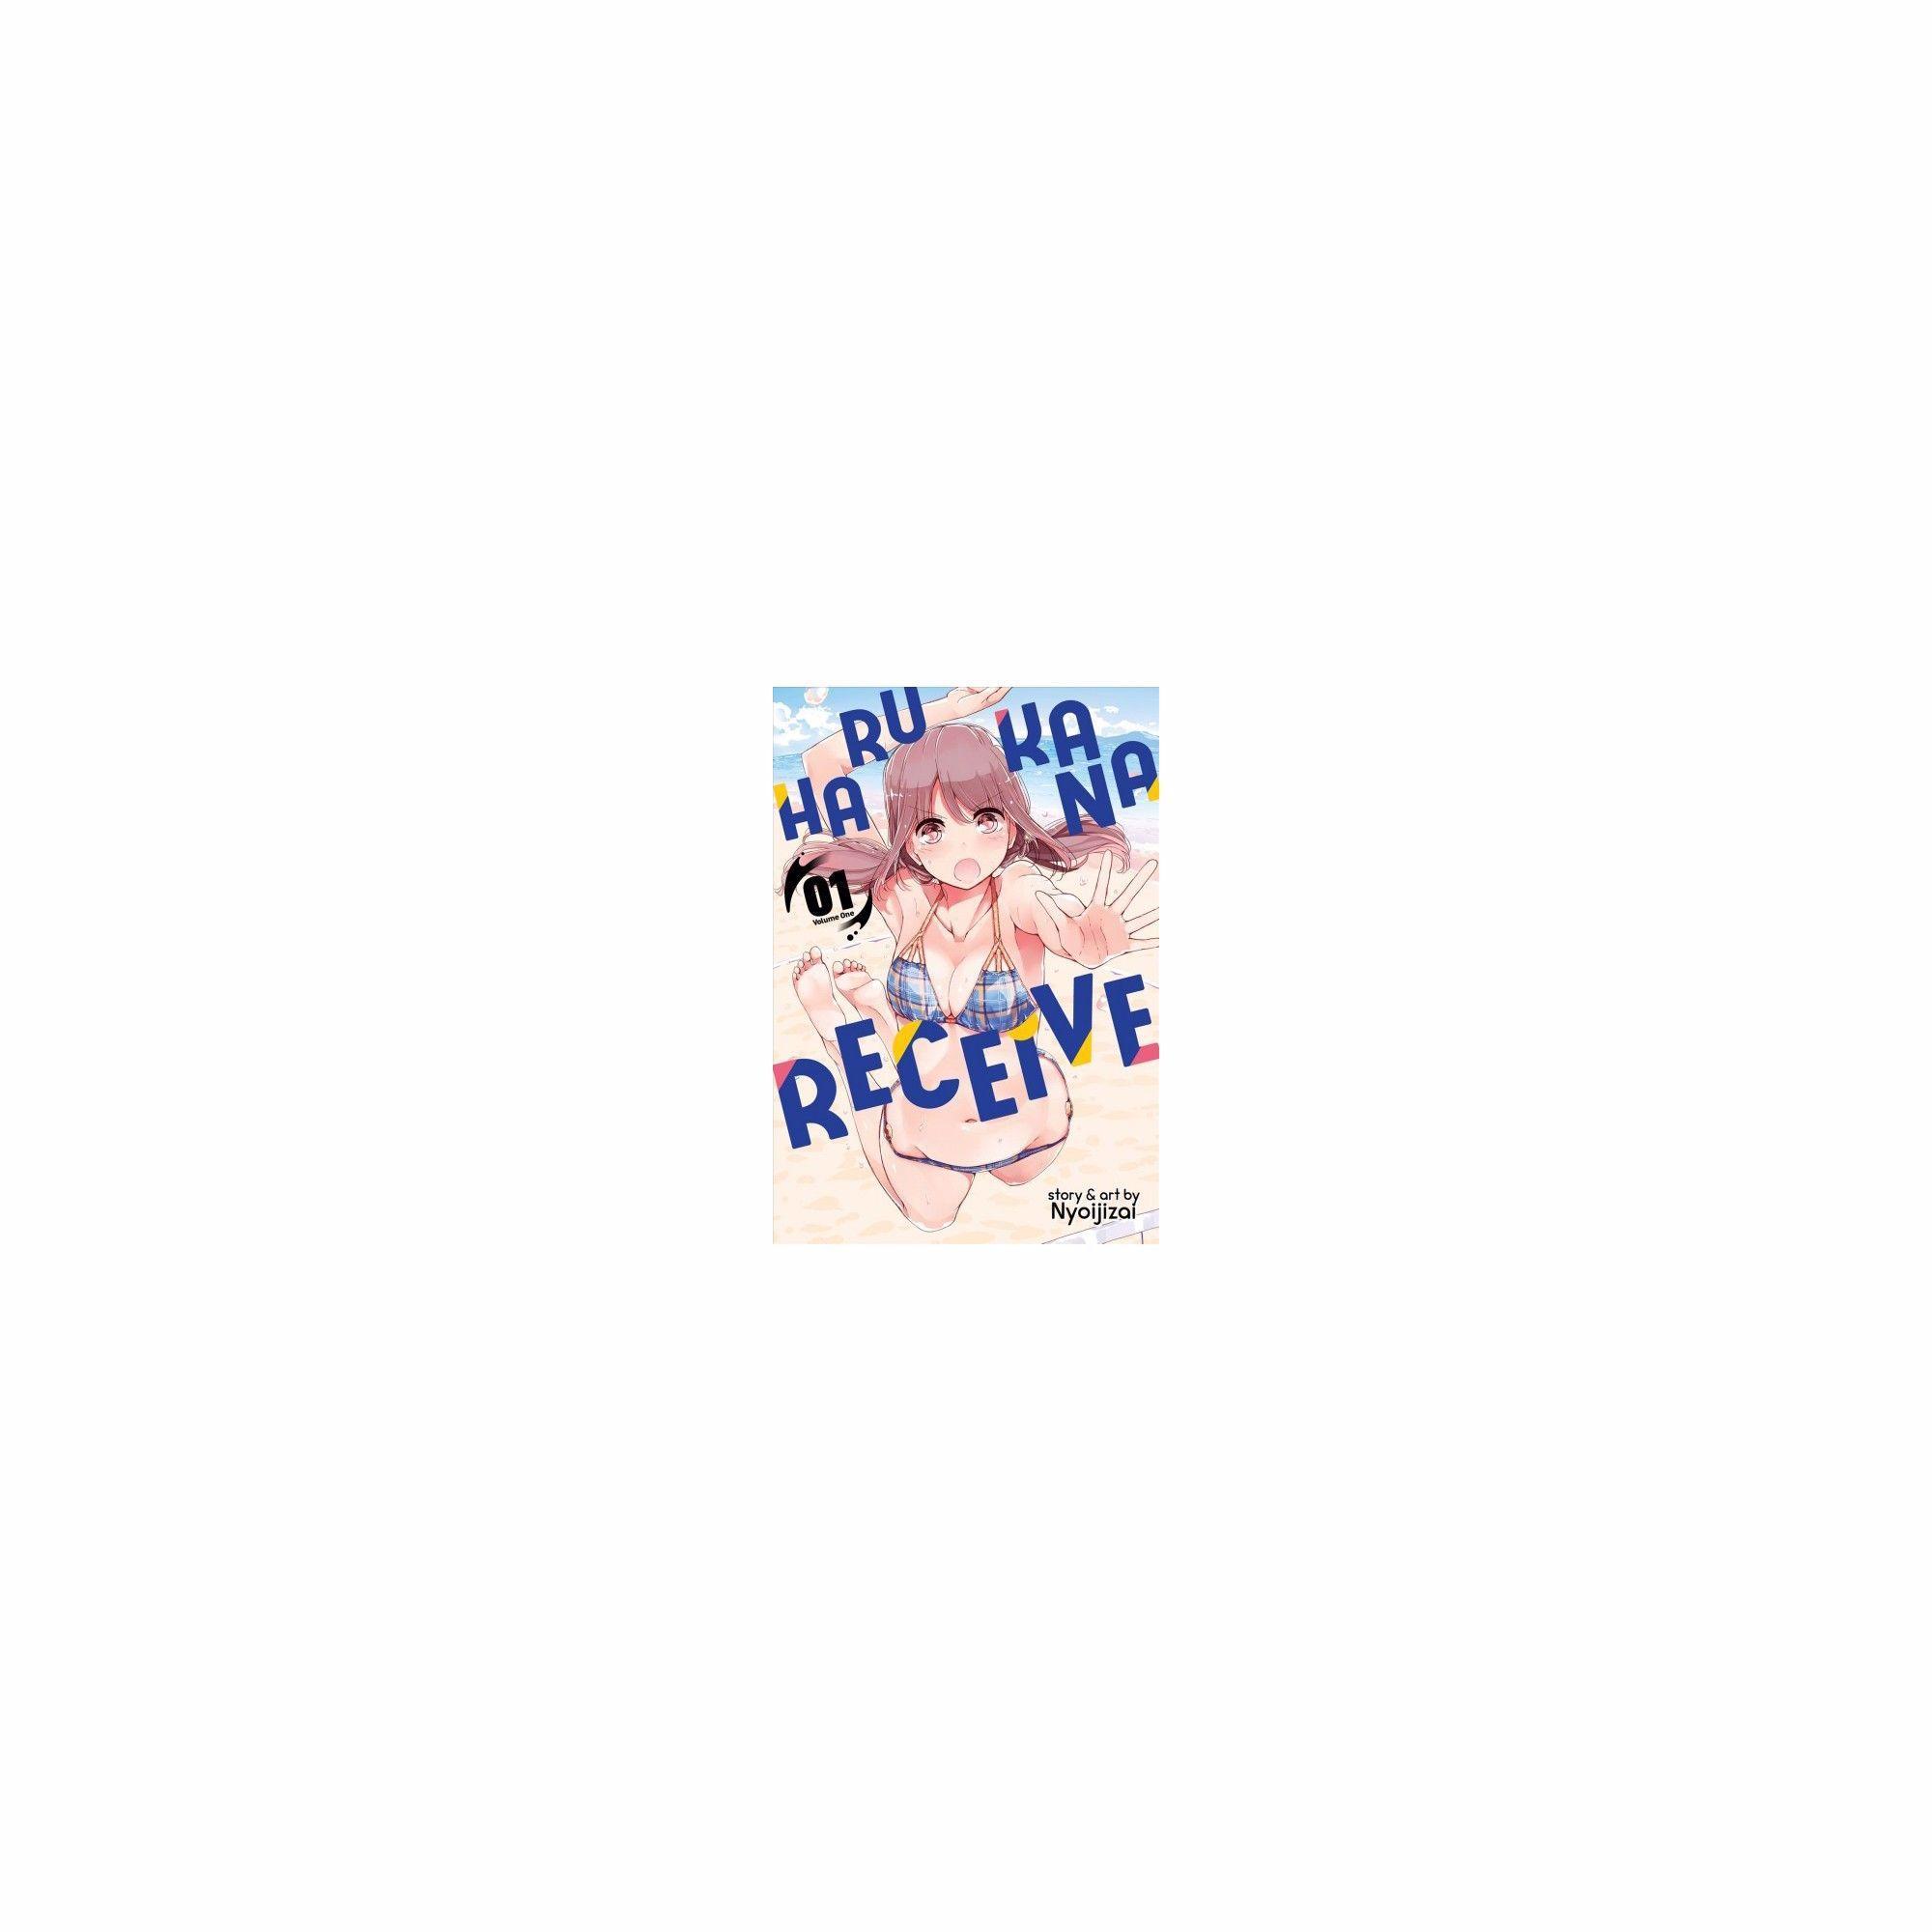 Harukana Receive Kanata In 2020 Paperbacks Books For Teens Juvenile Fiction